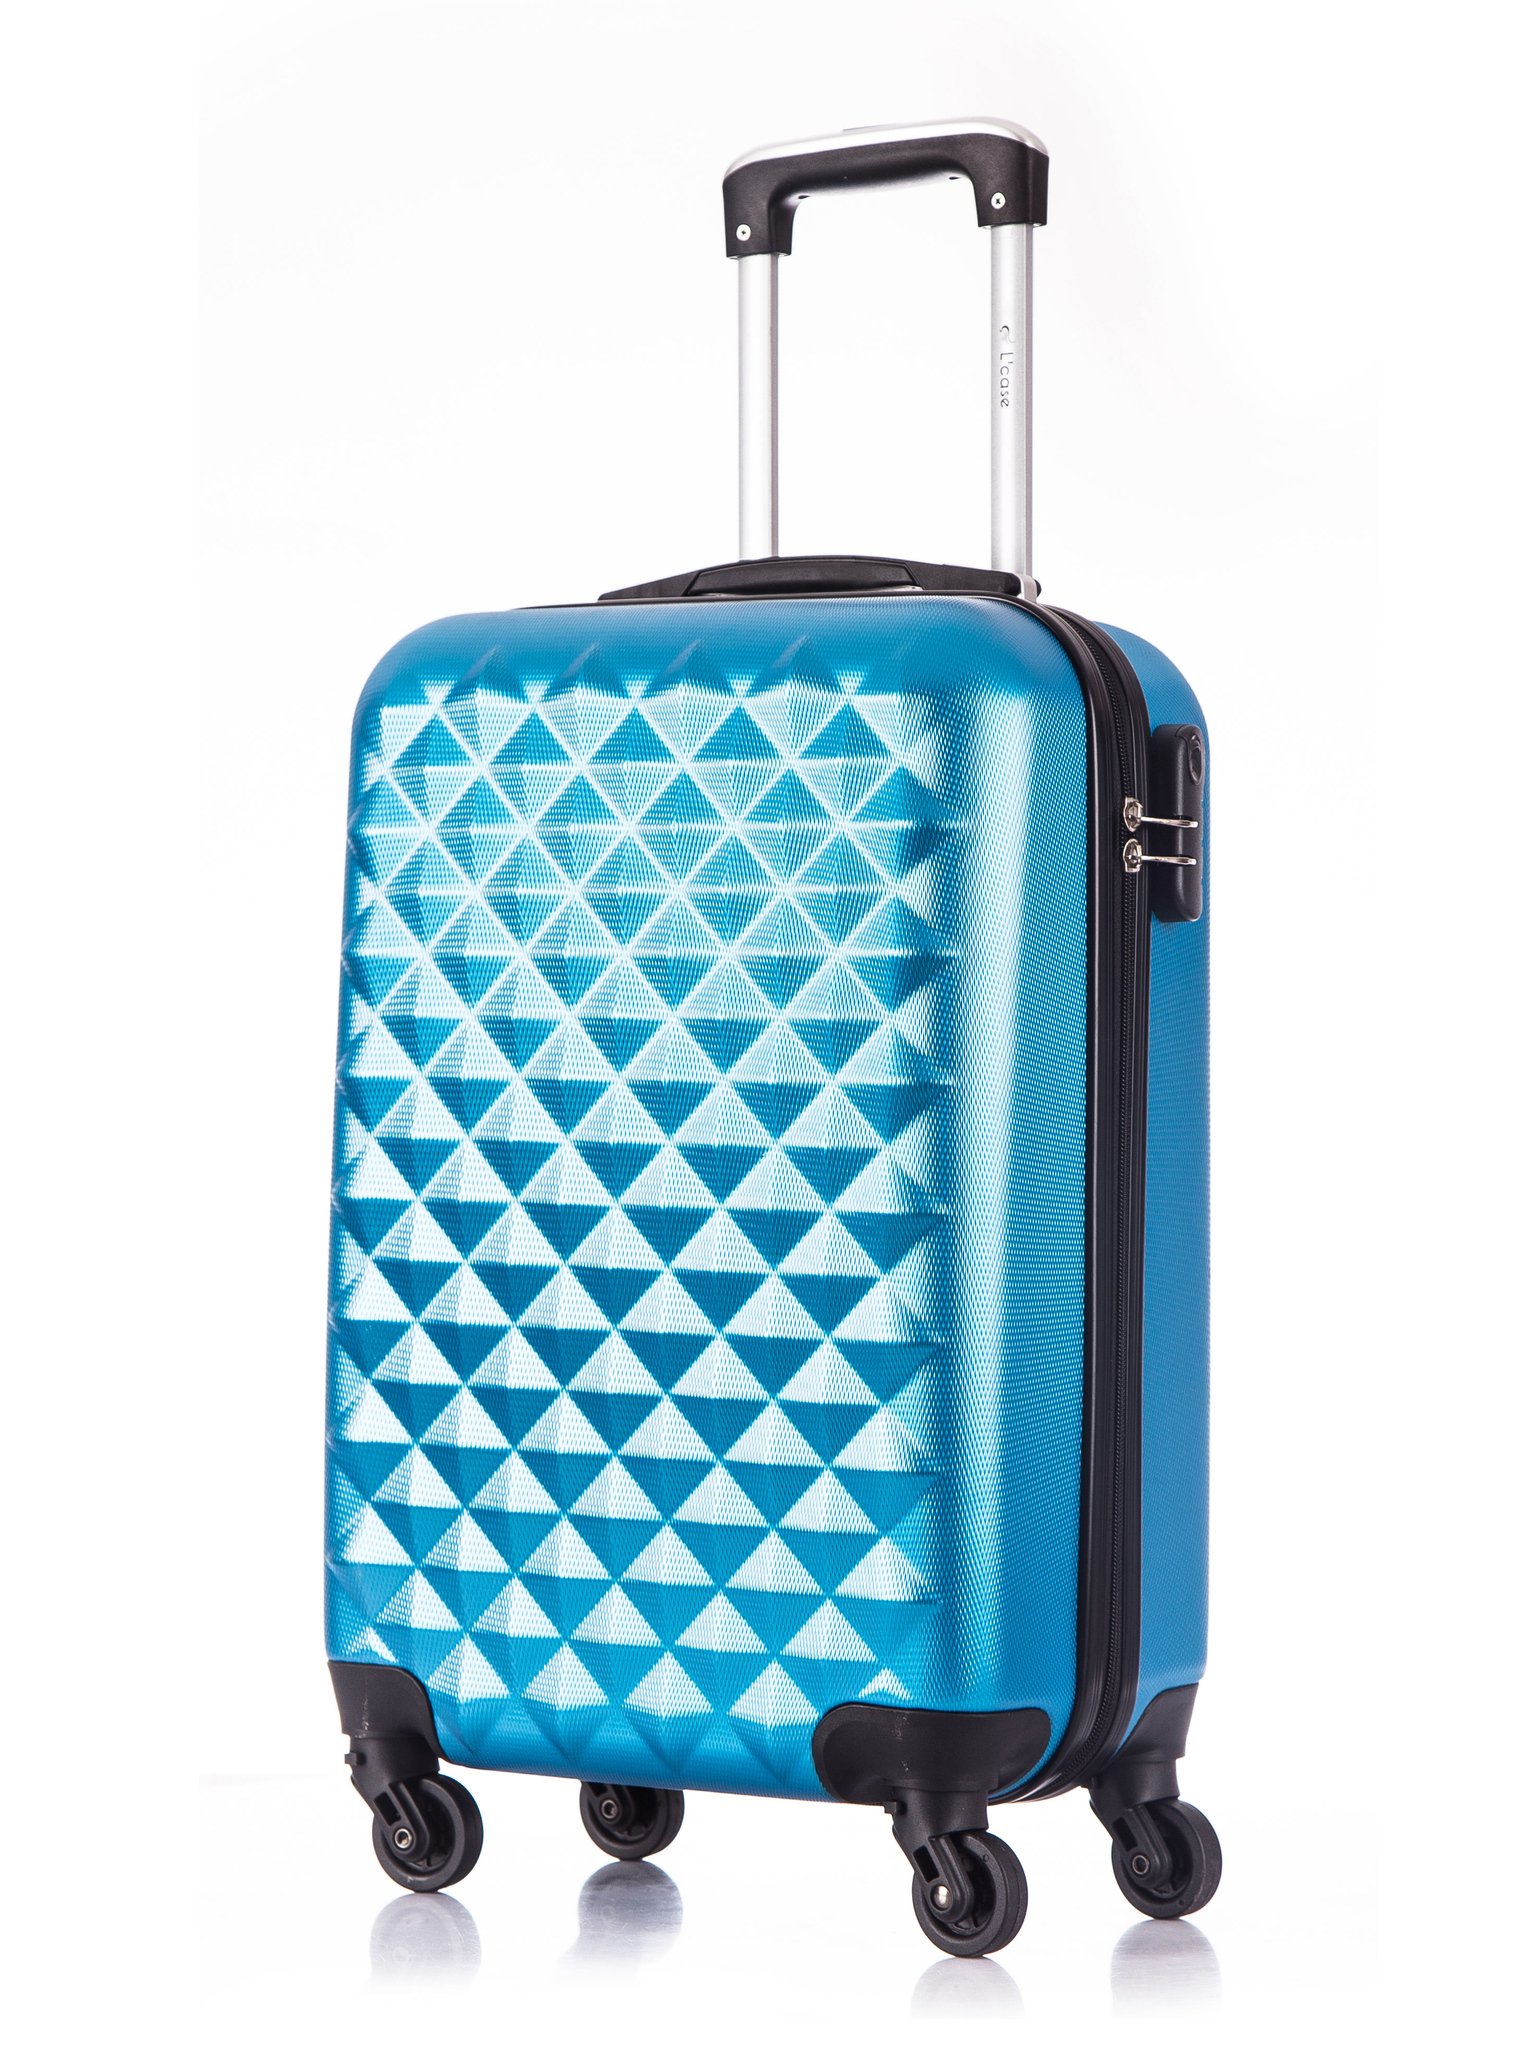 Чемодан со съемными колесами L'case Phatthaya-20 Синий ручная кладь (S)